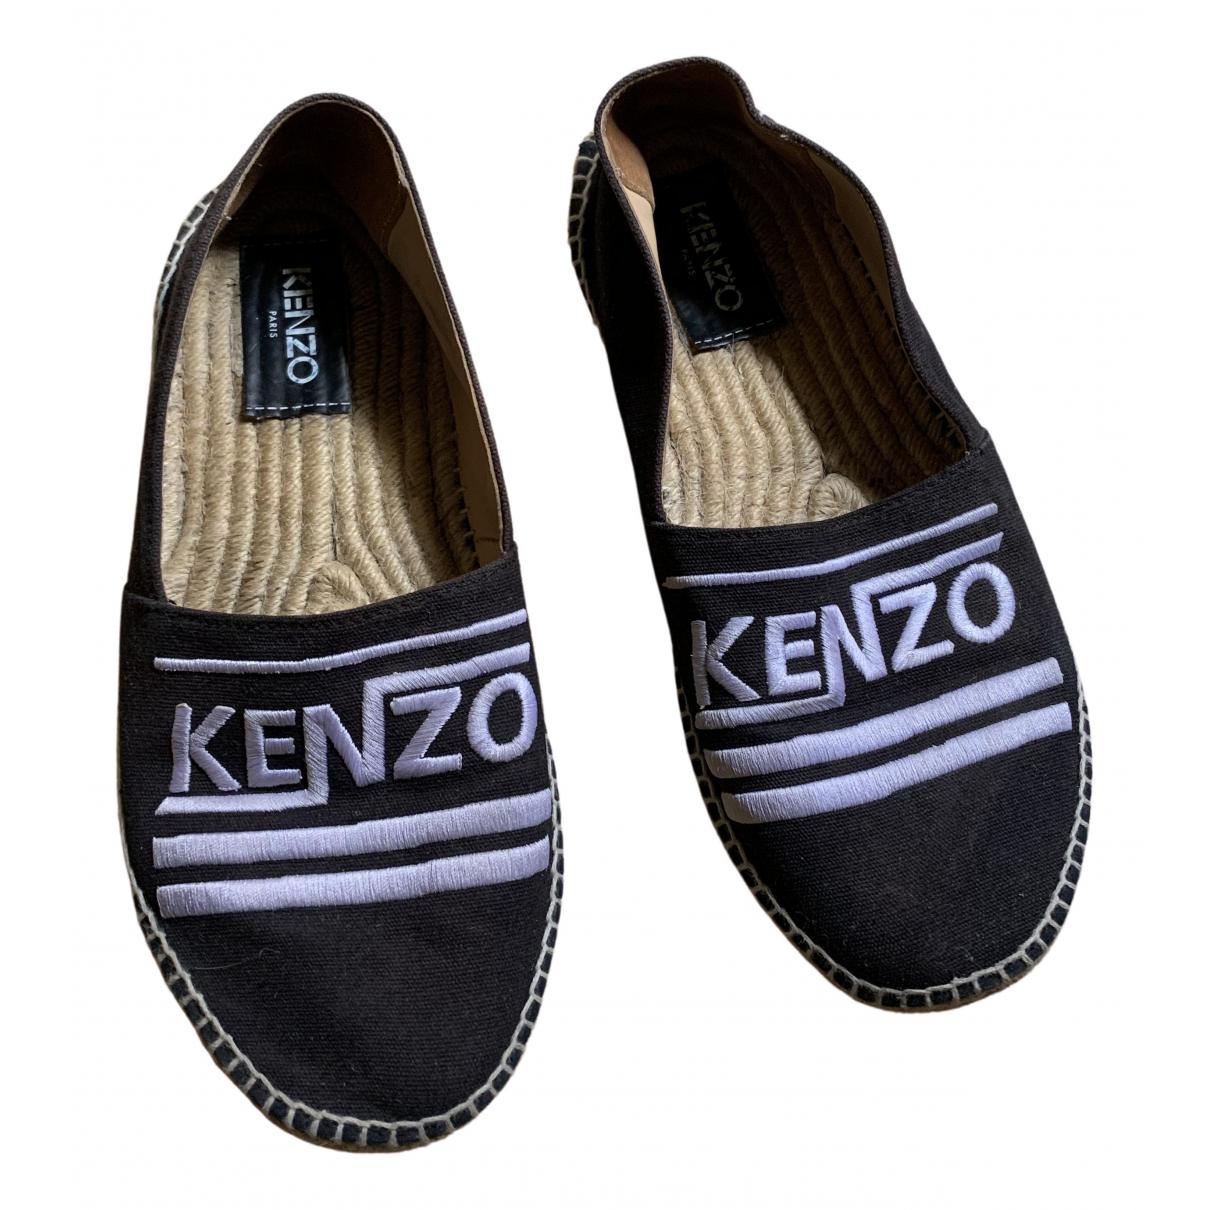 Kenzo \N Espadrilles in  Schwarz Polyester